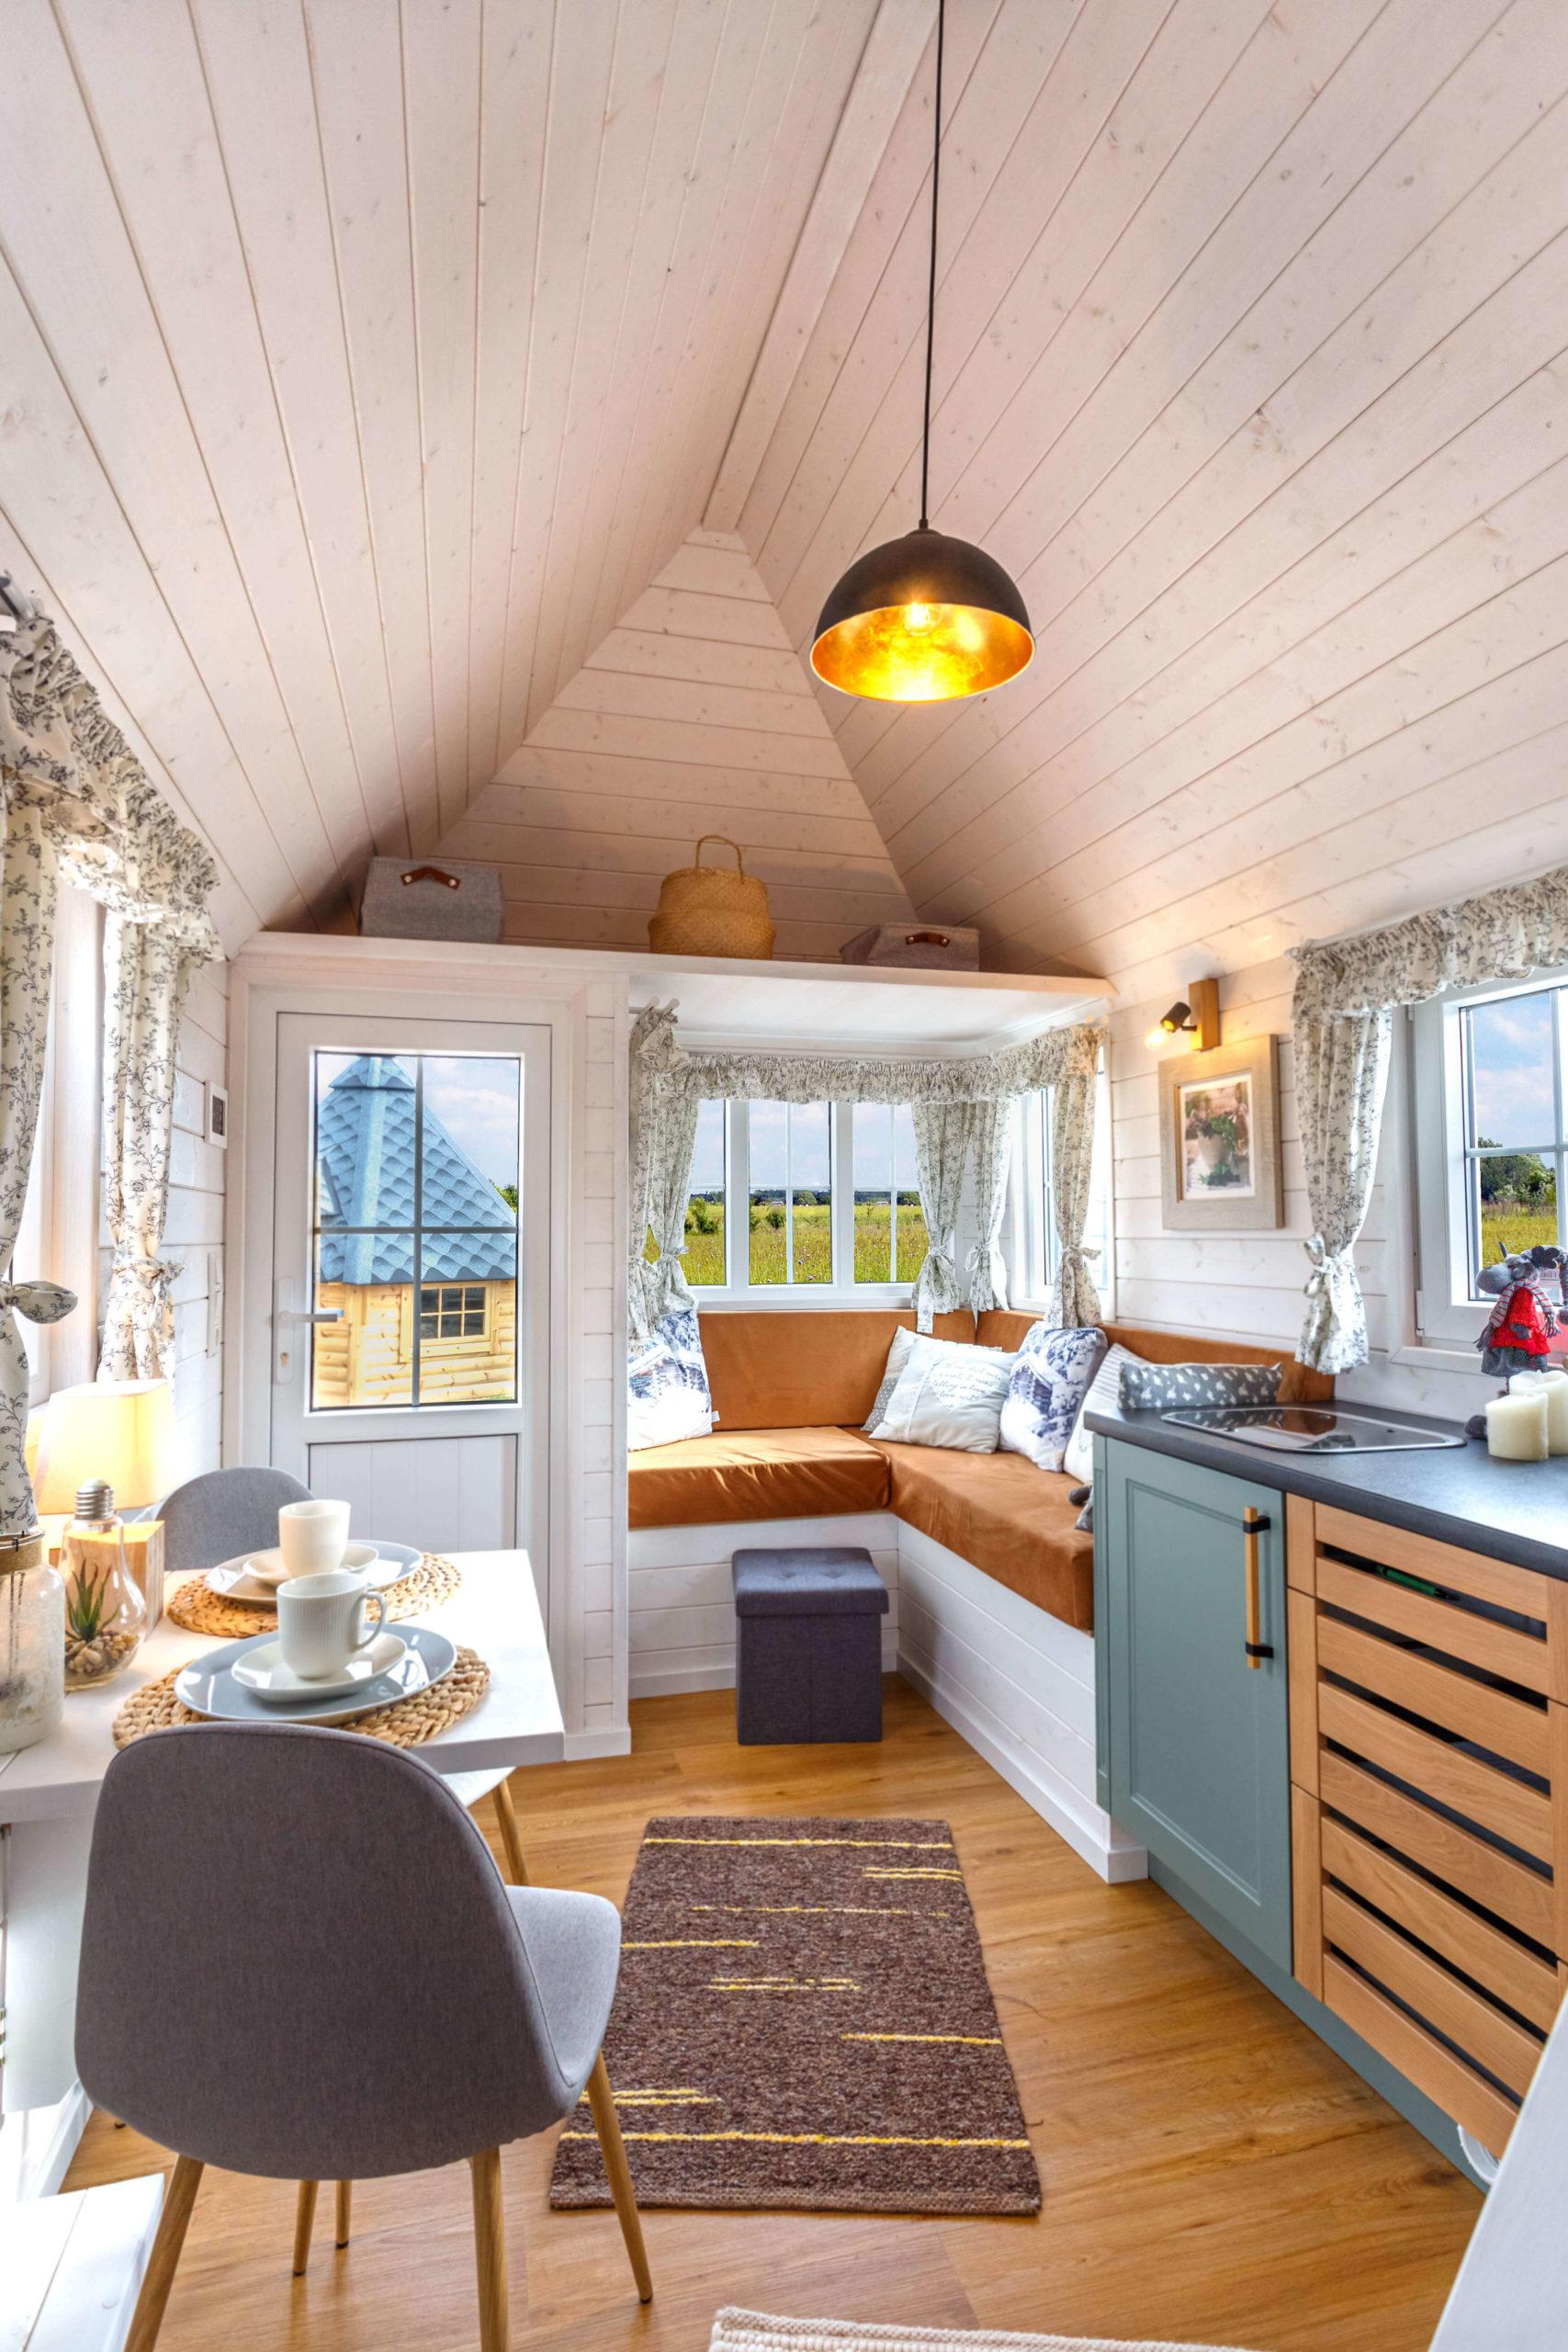 mobiles-tiny-house-schweden-vital-camp-gmbh-13